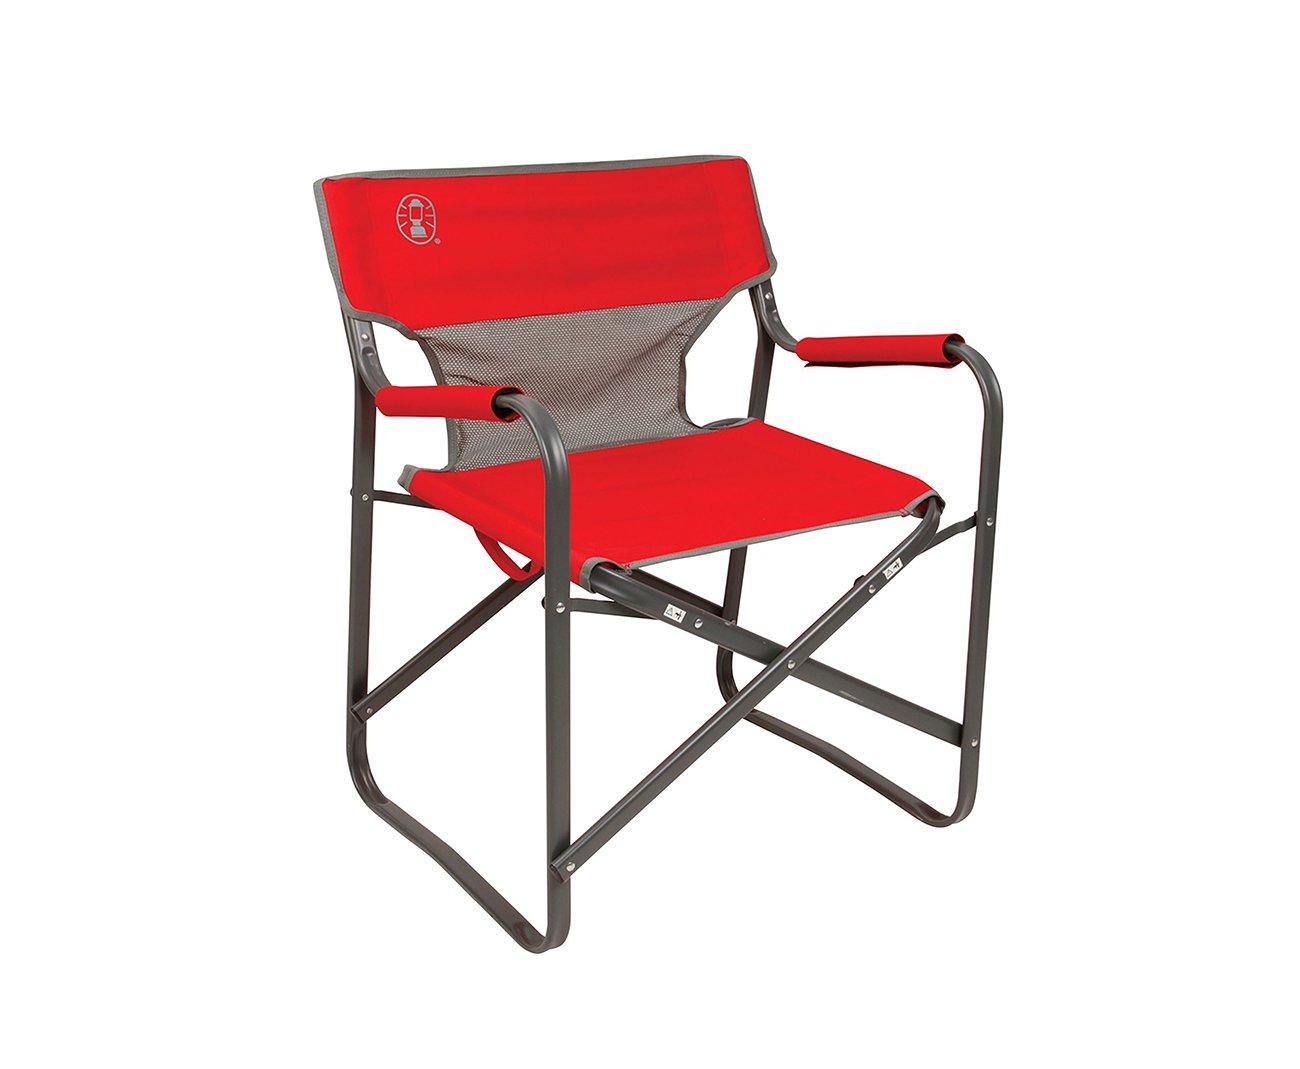 Cadeira Dobrável Coleman Steel Deck Vermelha